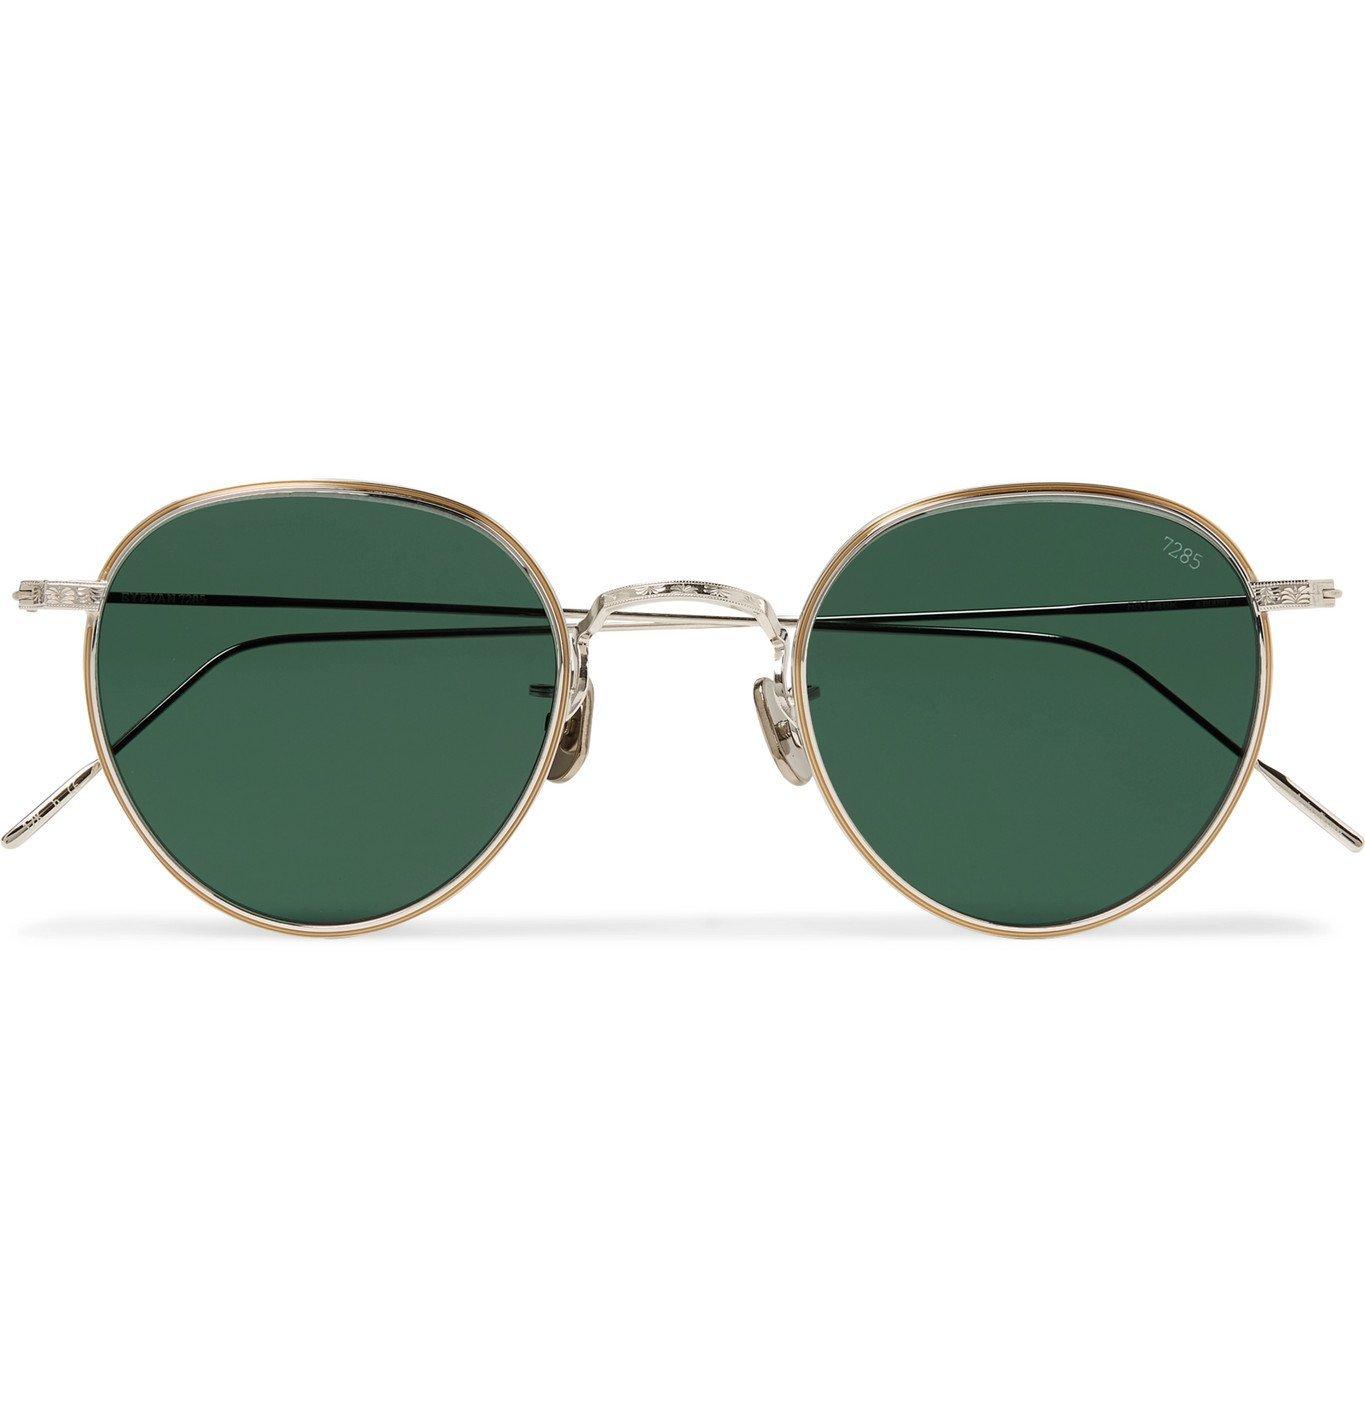 Photo: Eyevan 7285 - Round-Frame Gold-Tone and Titanium Sunglasses - Green